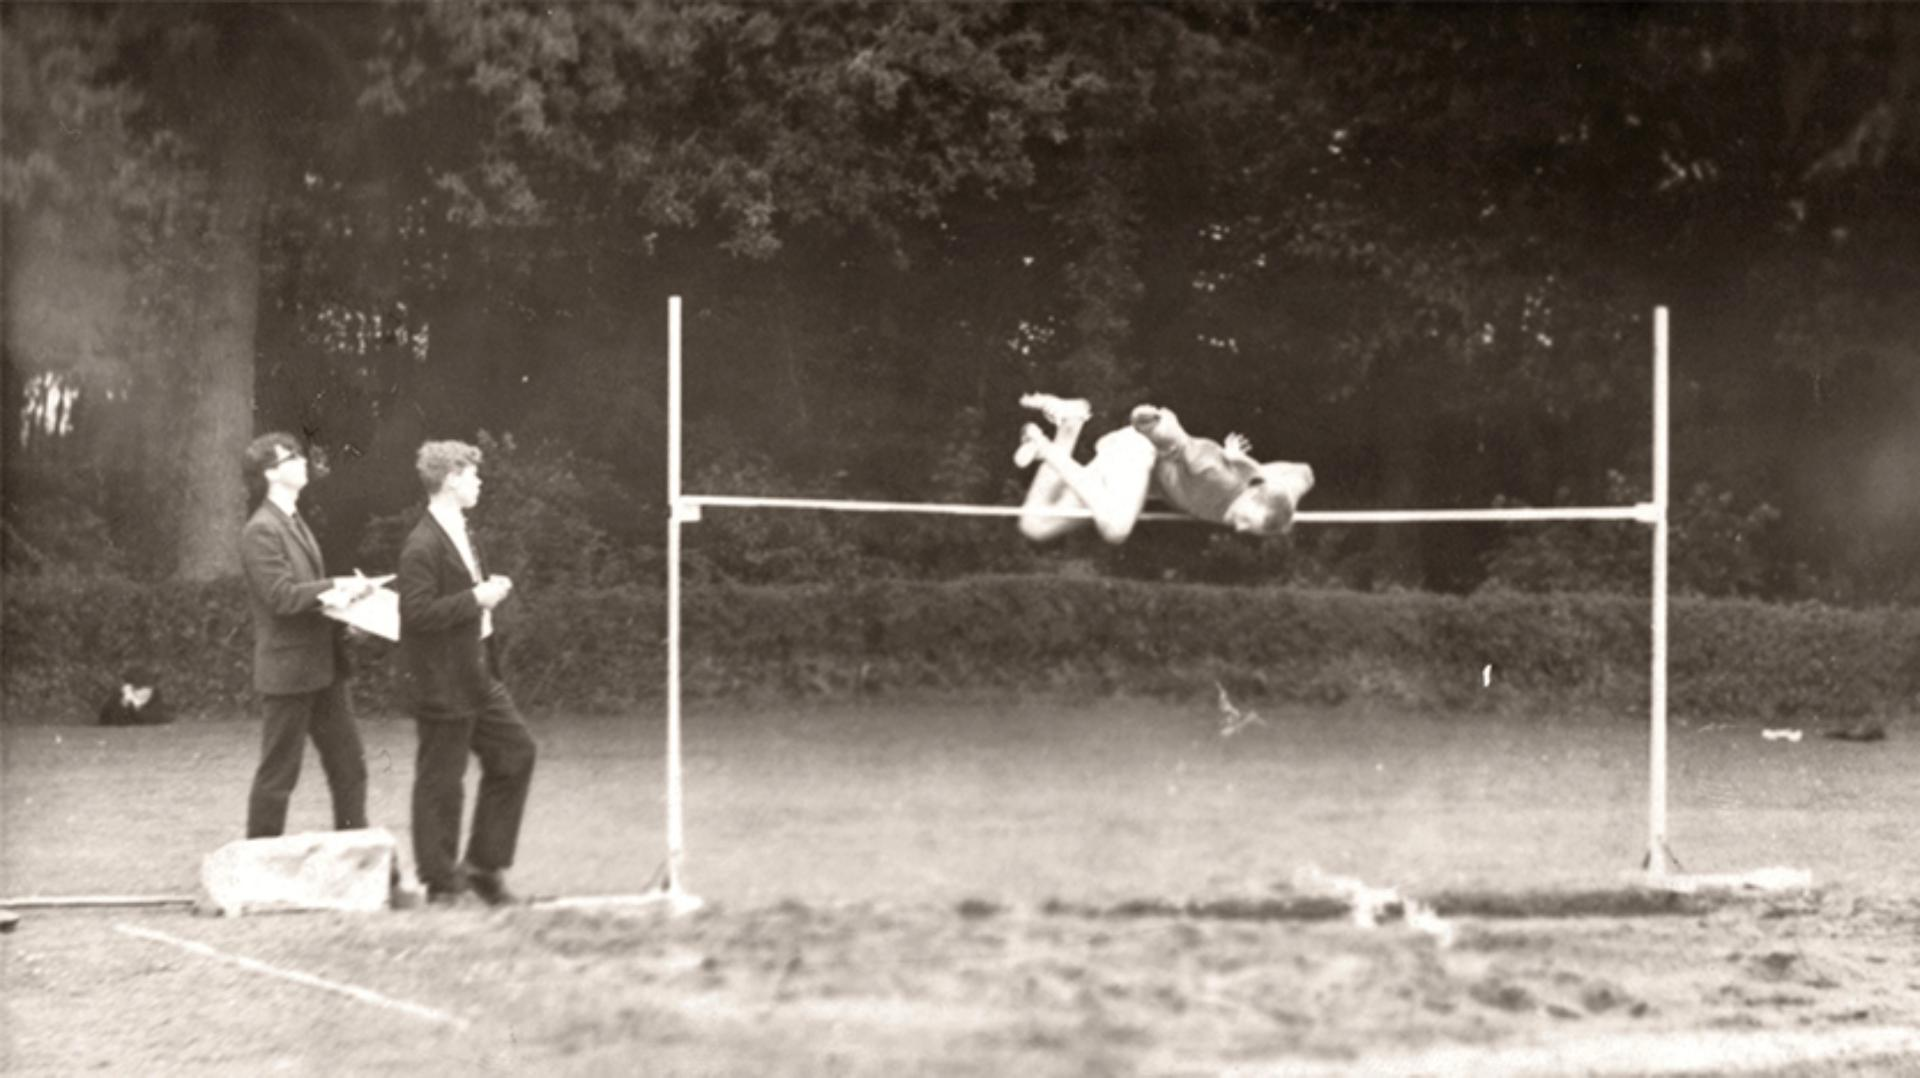 James Dyson captured mid-air above the high jump